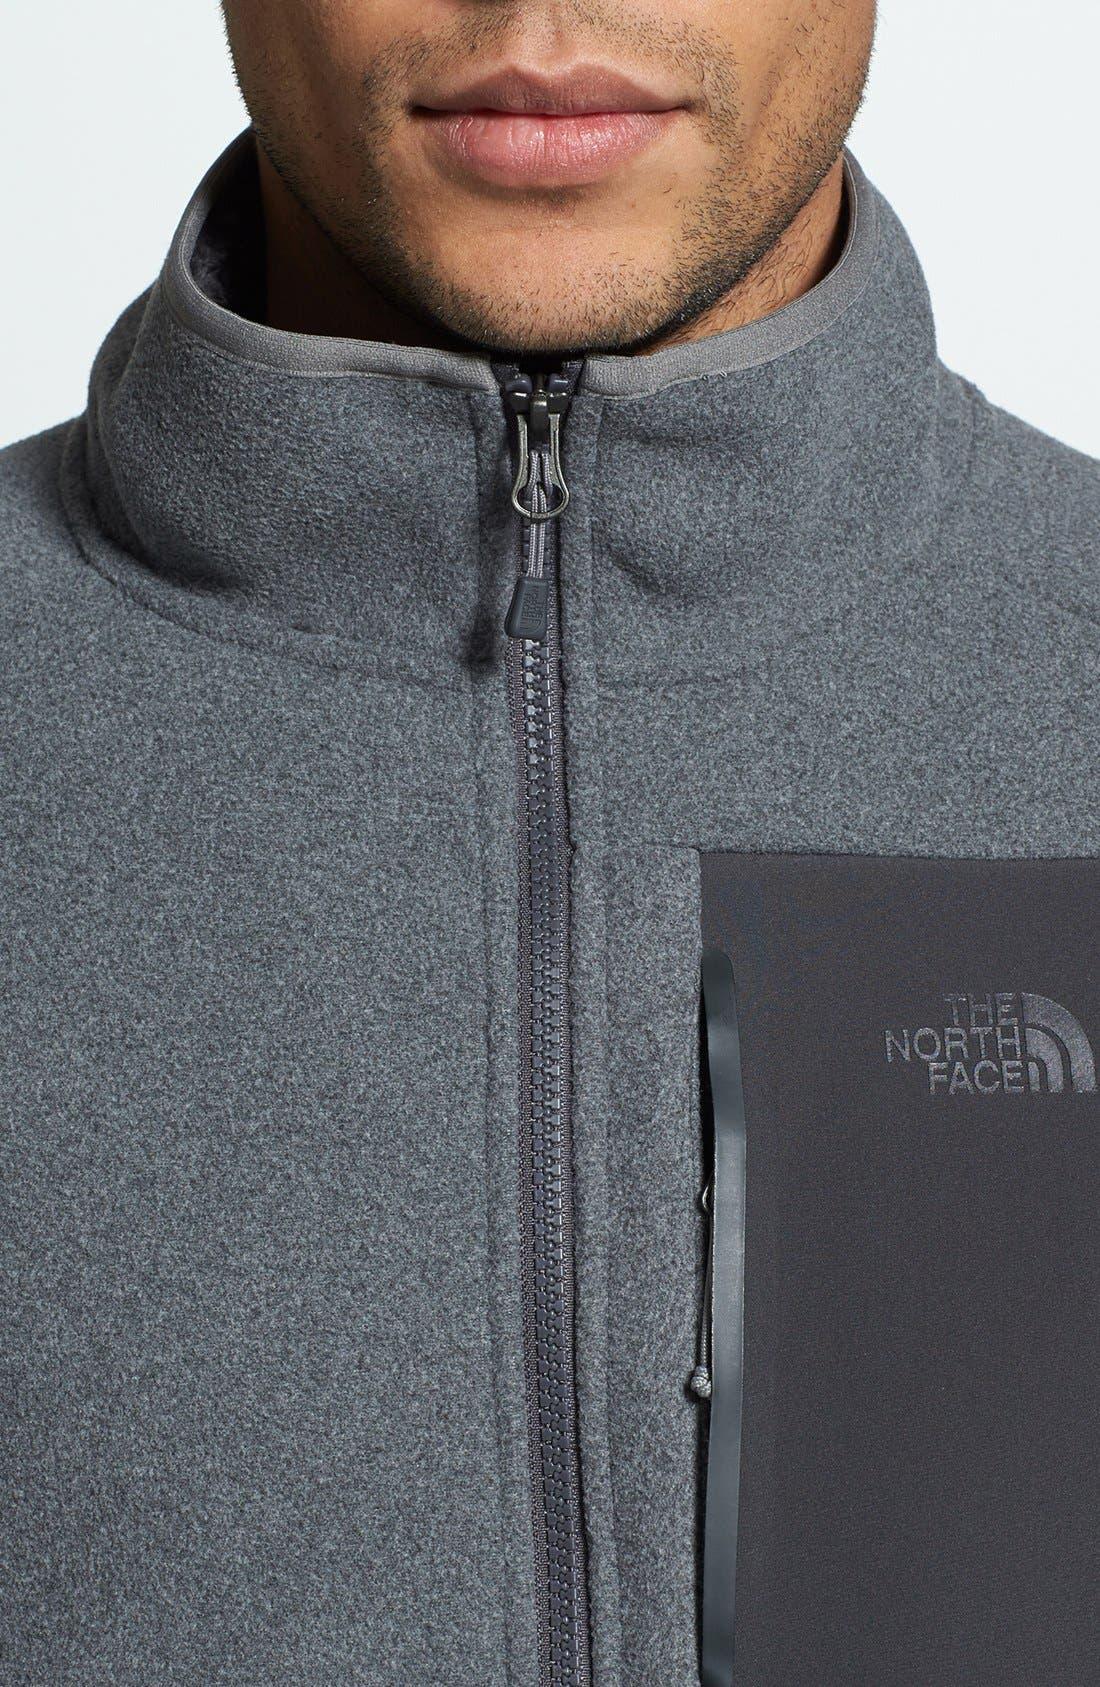 'Chimborazo' Zip Front Fleece Jacket,                             Alternate thumbnail 35, color,